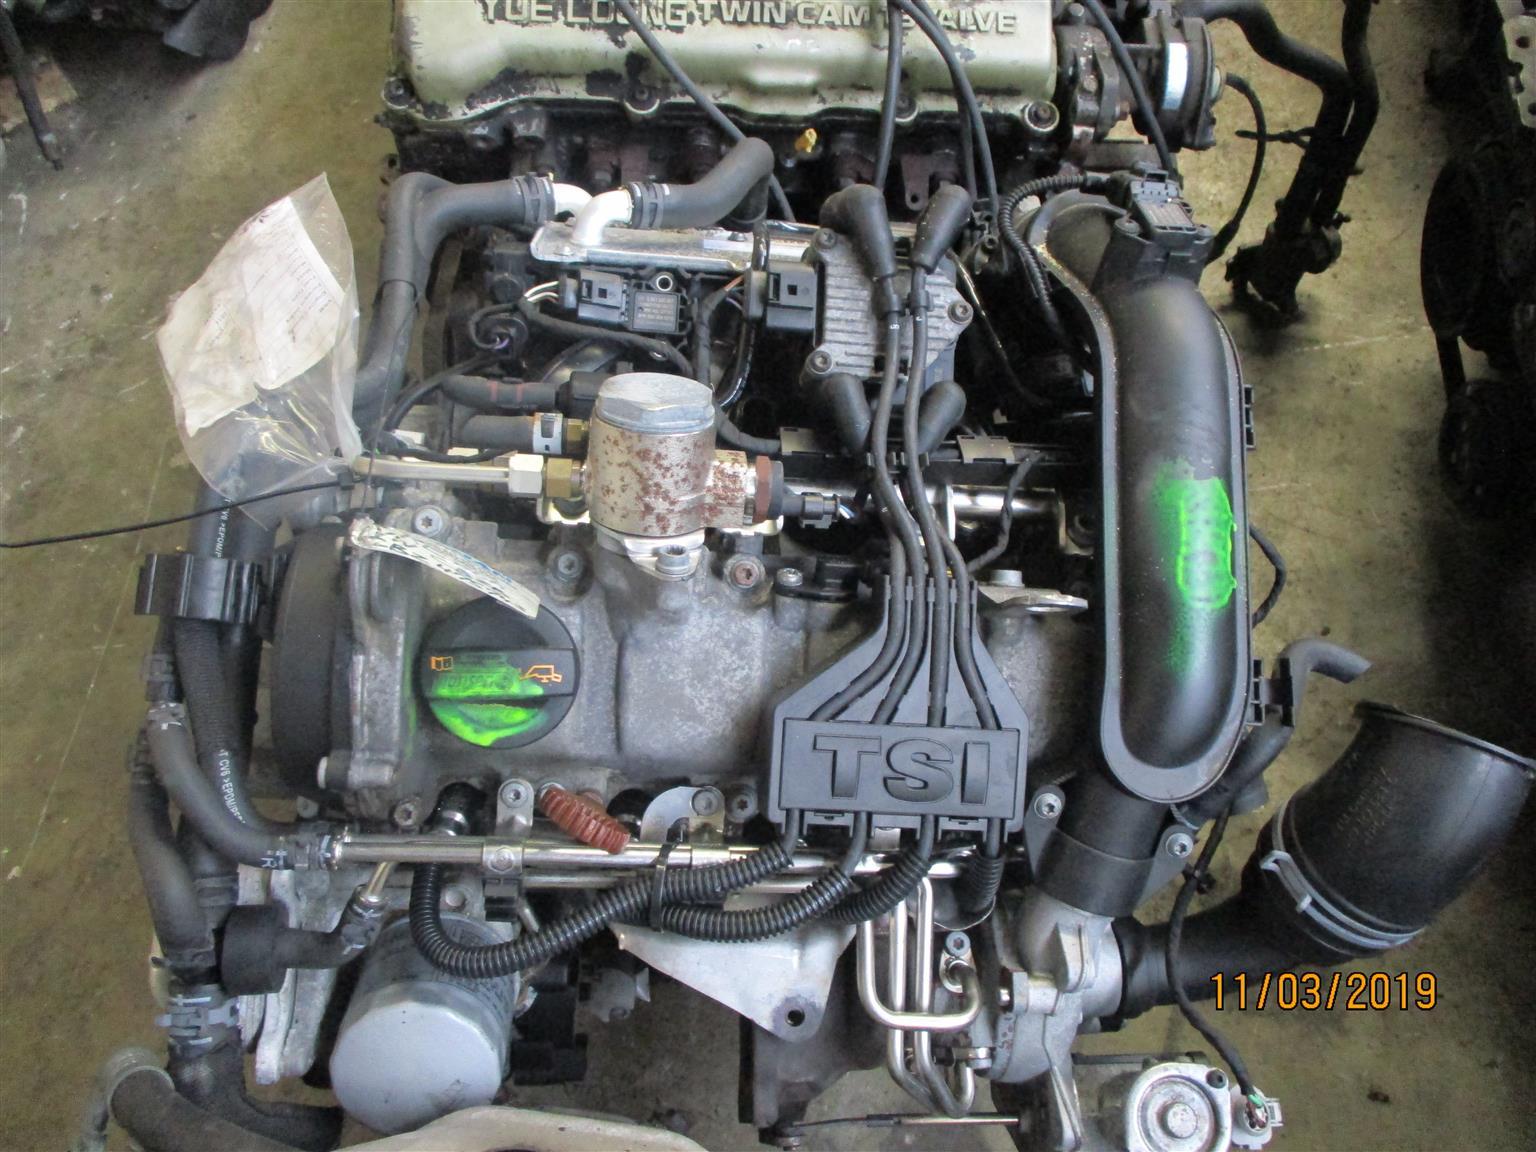 VW Golf 6 1 2 tsi engine for sale